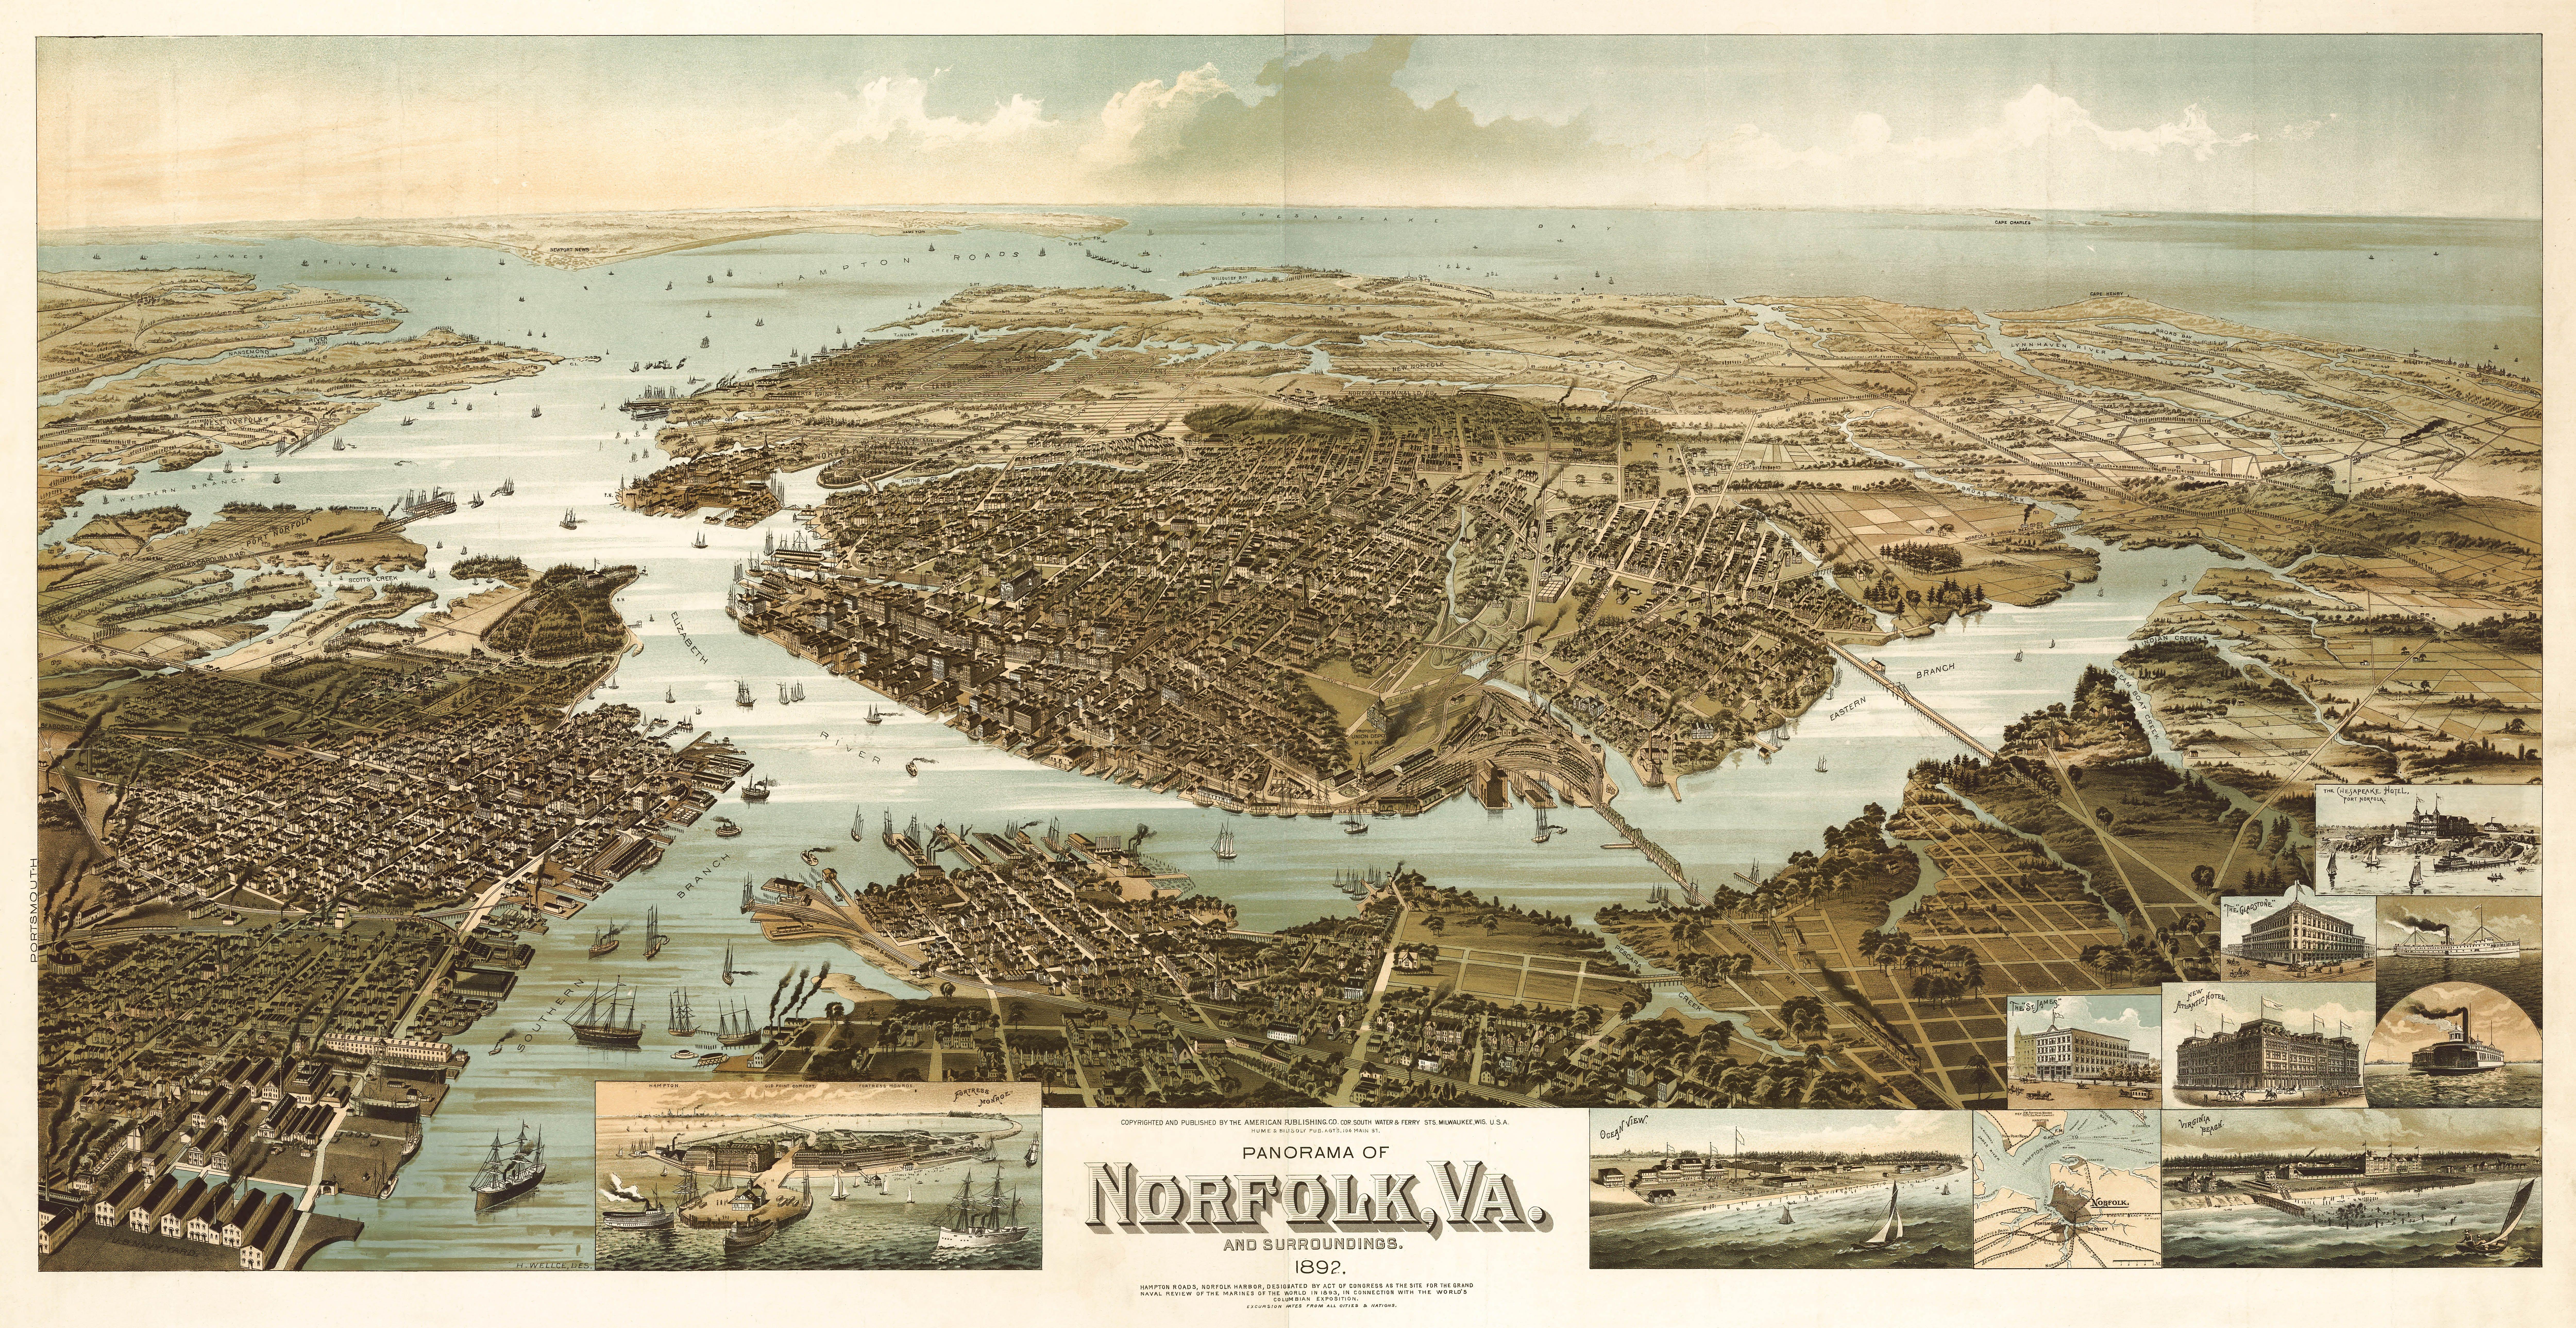 24x36 Washington DC 1892 Historic Panoramic Town Map